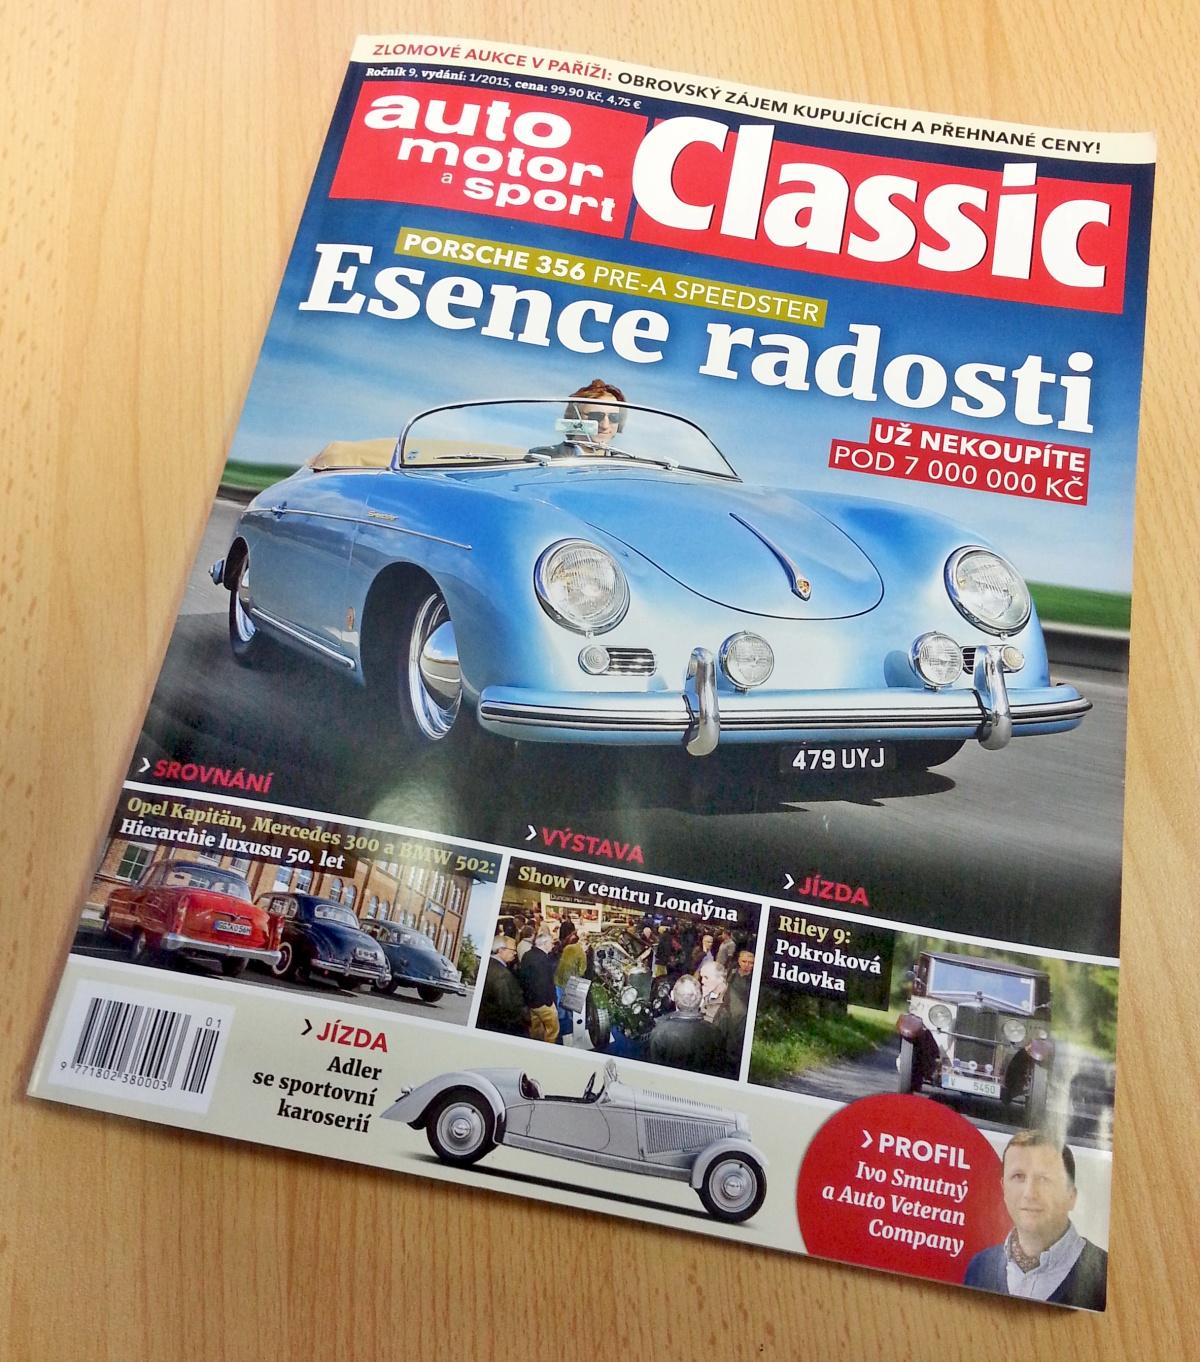 Rolls-Royce-Silver-Cloud-auto-motor-sport-classic-01